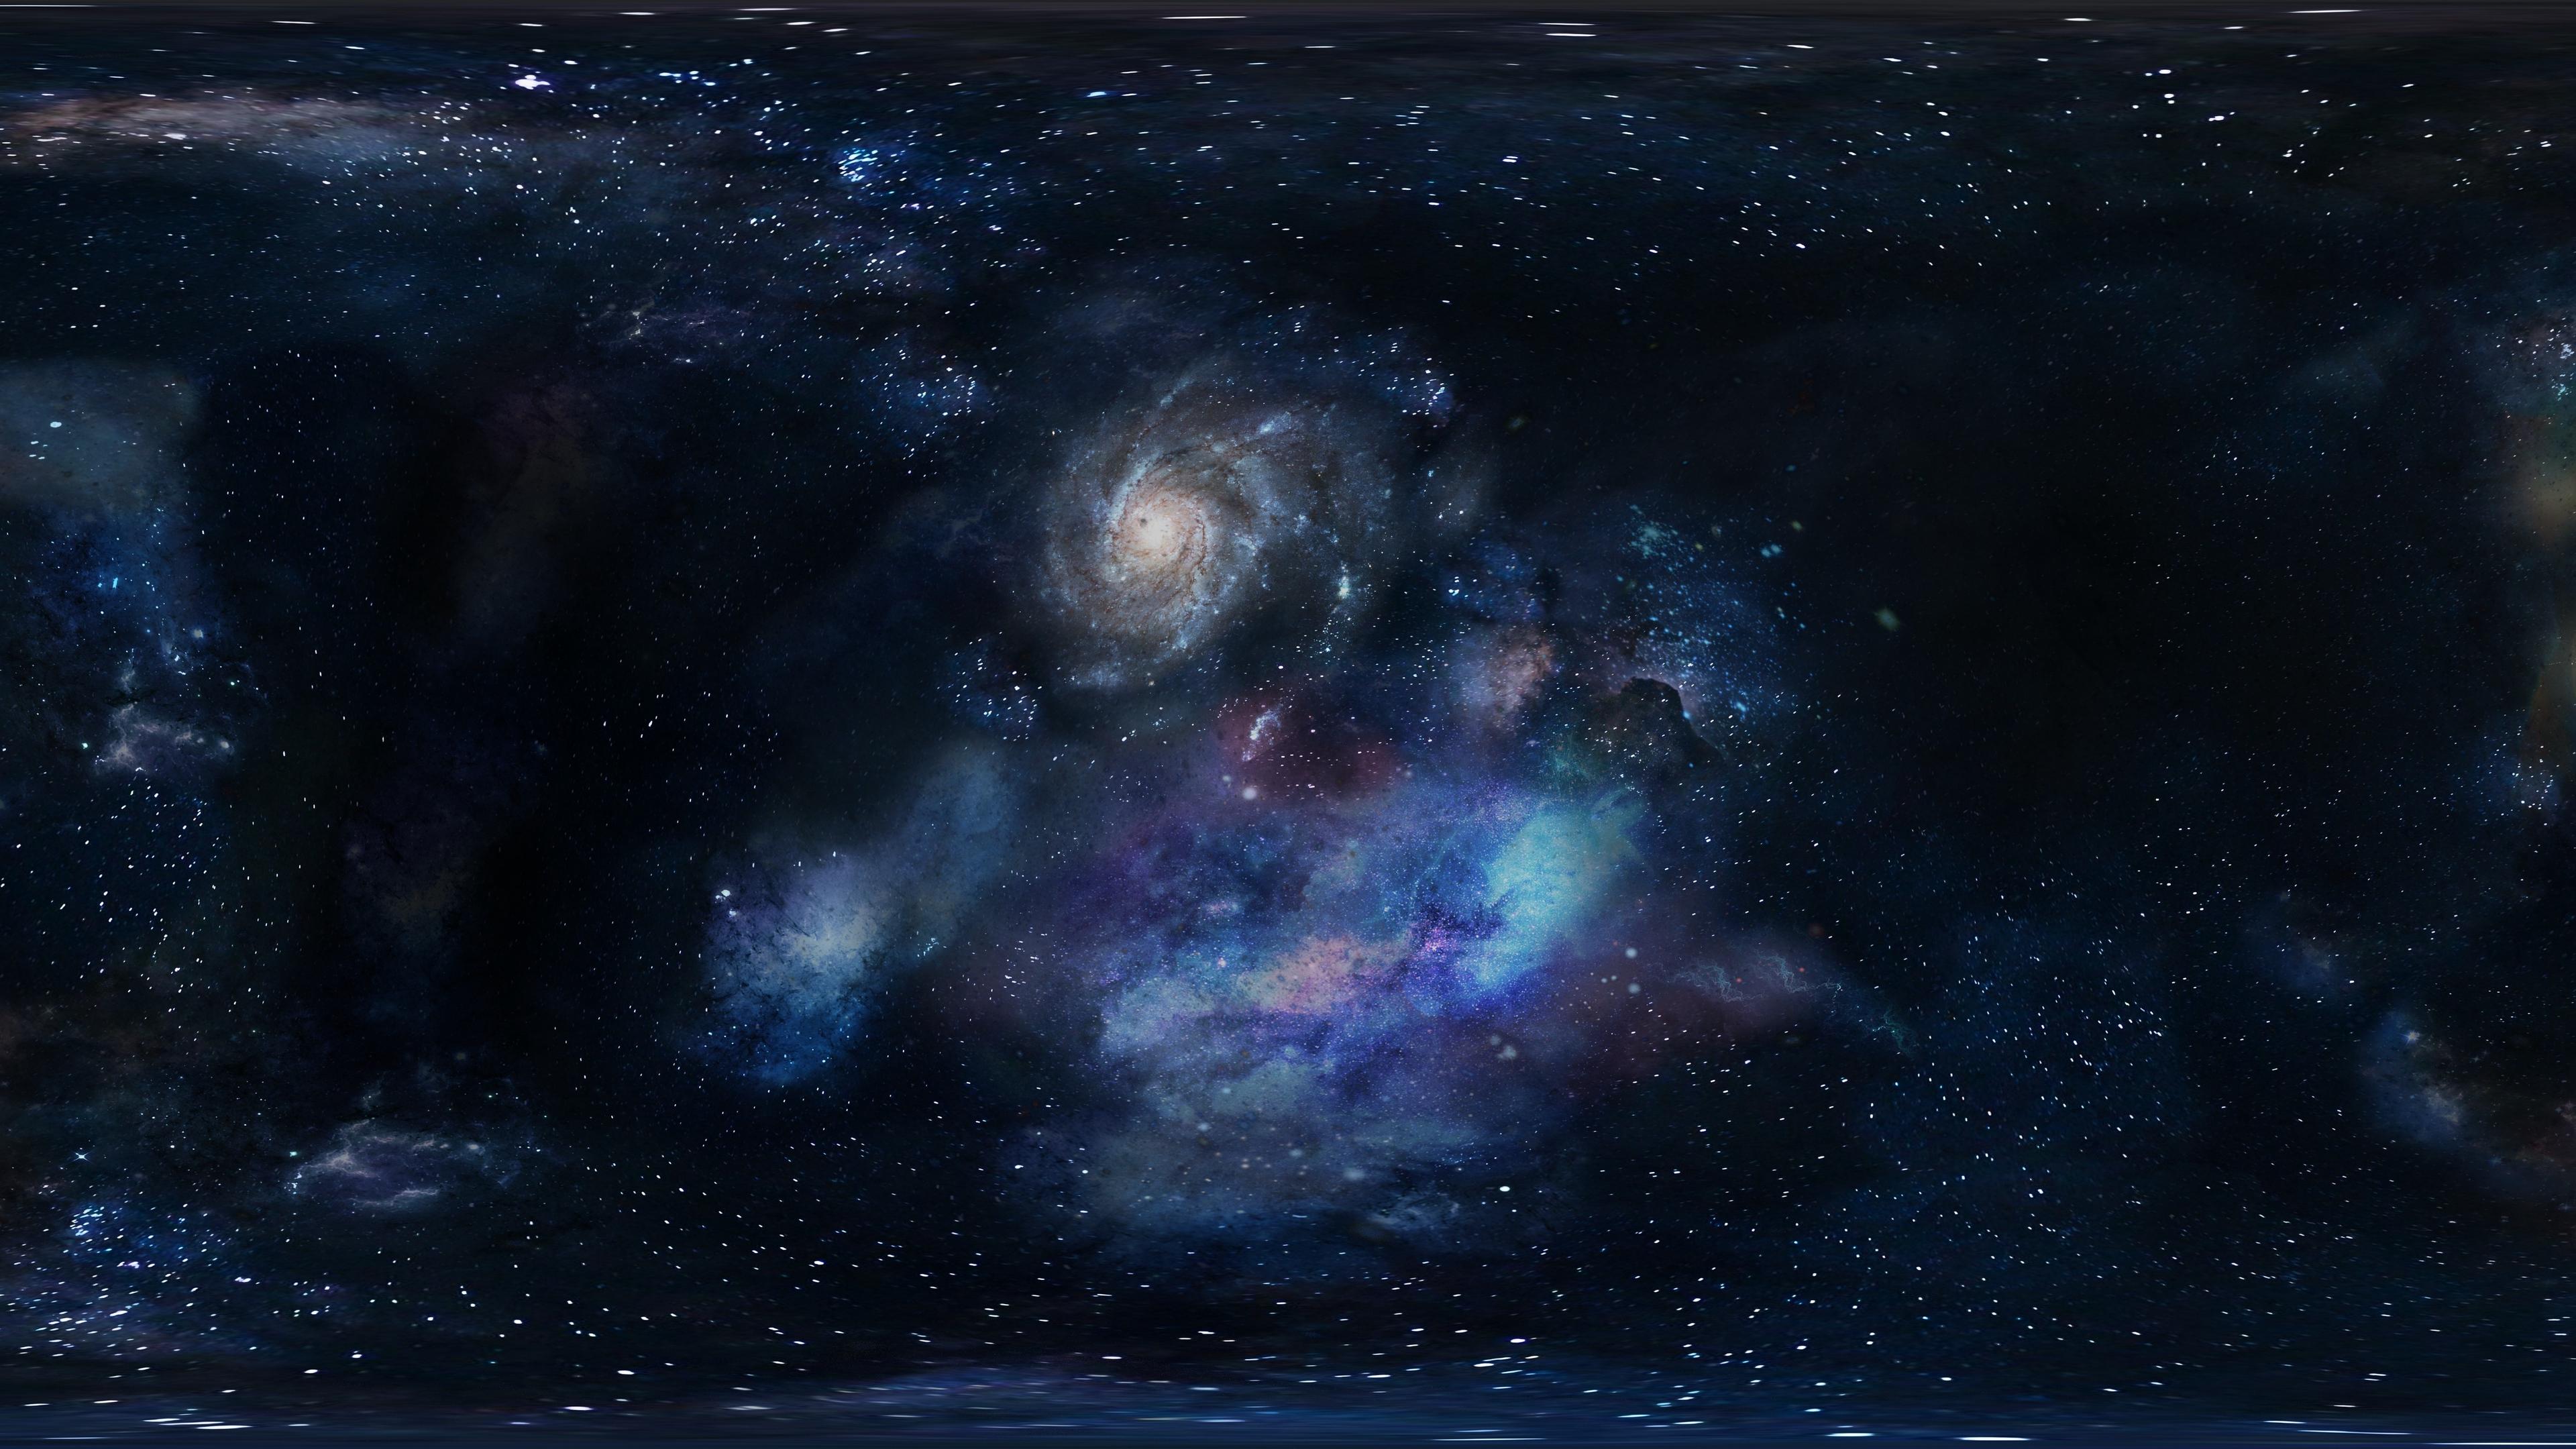 galaxy space stars 4k 1536016643 - galaxy, space, stars 4k - Stars, Space, Galaxy